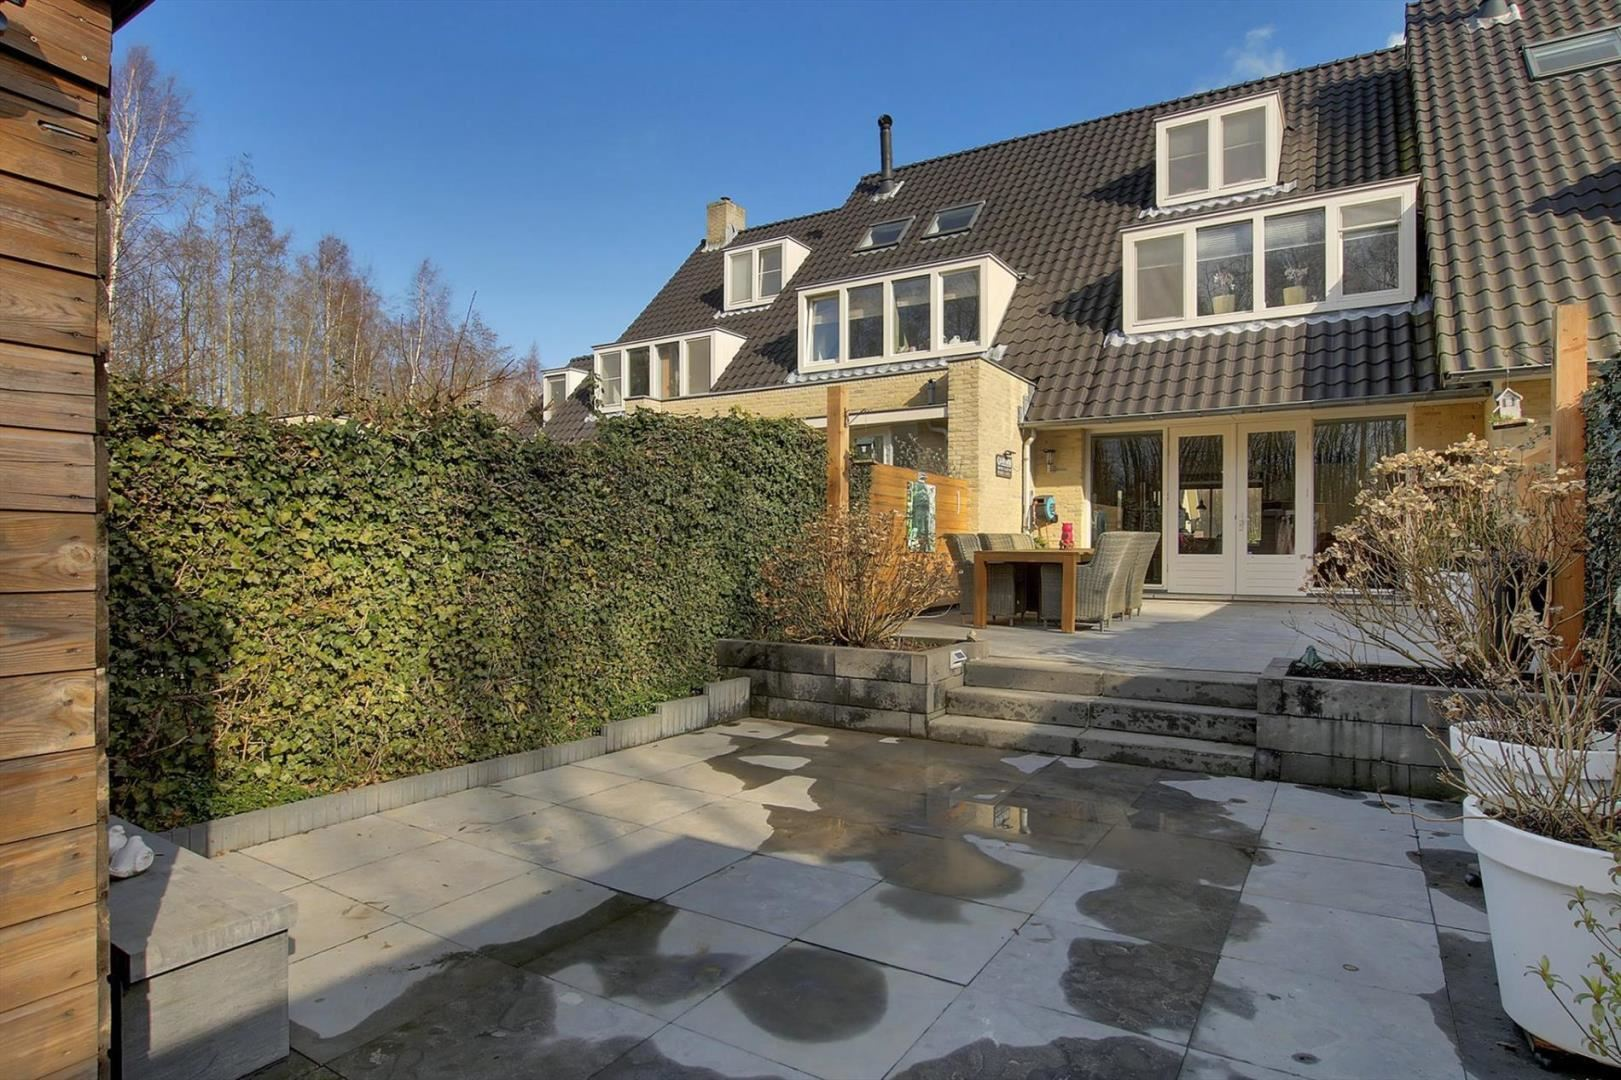 Verkocht: Sprietzeil 78 1319 EC Almere [funda] Chagallweg 78 Almere